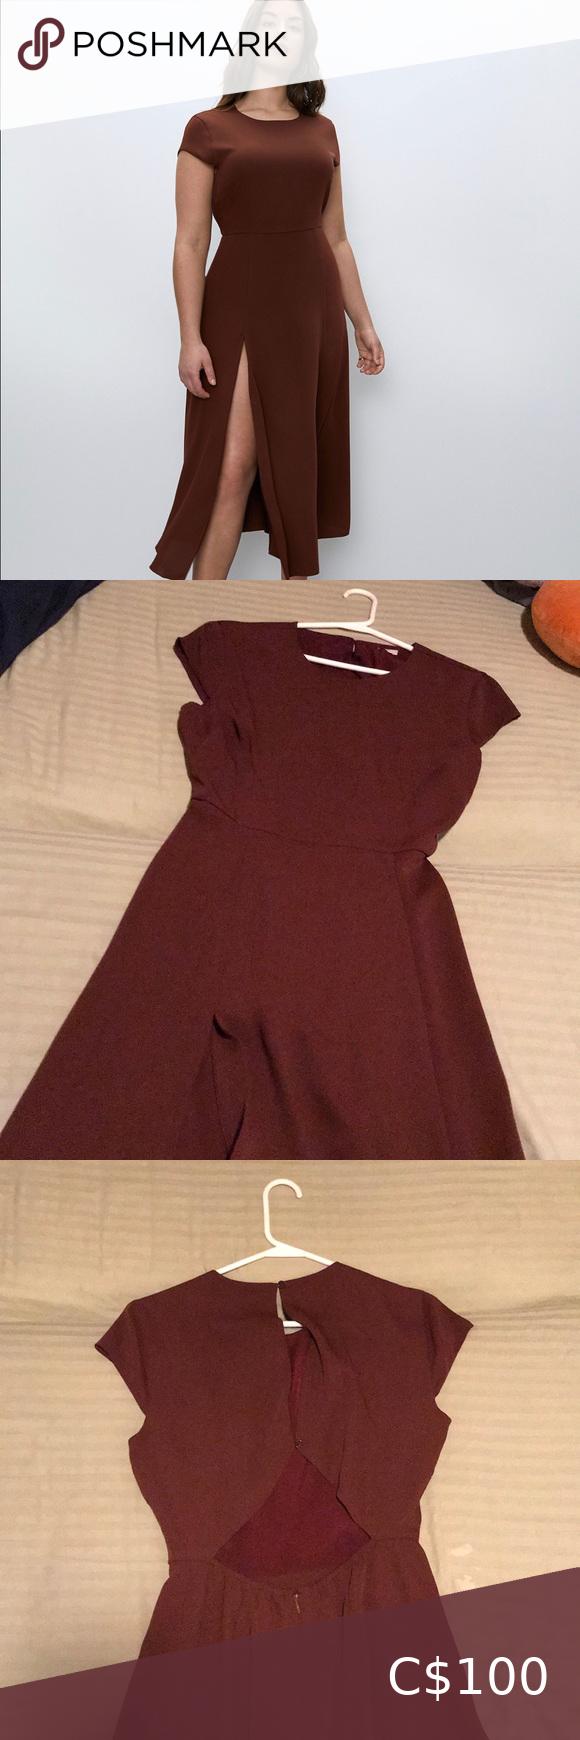 50+ Aritzia babaton hamptons dress trends